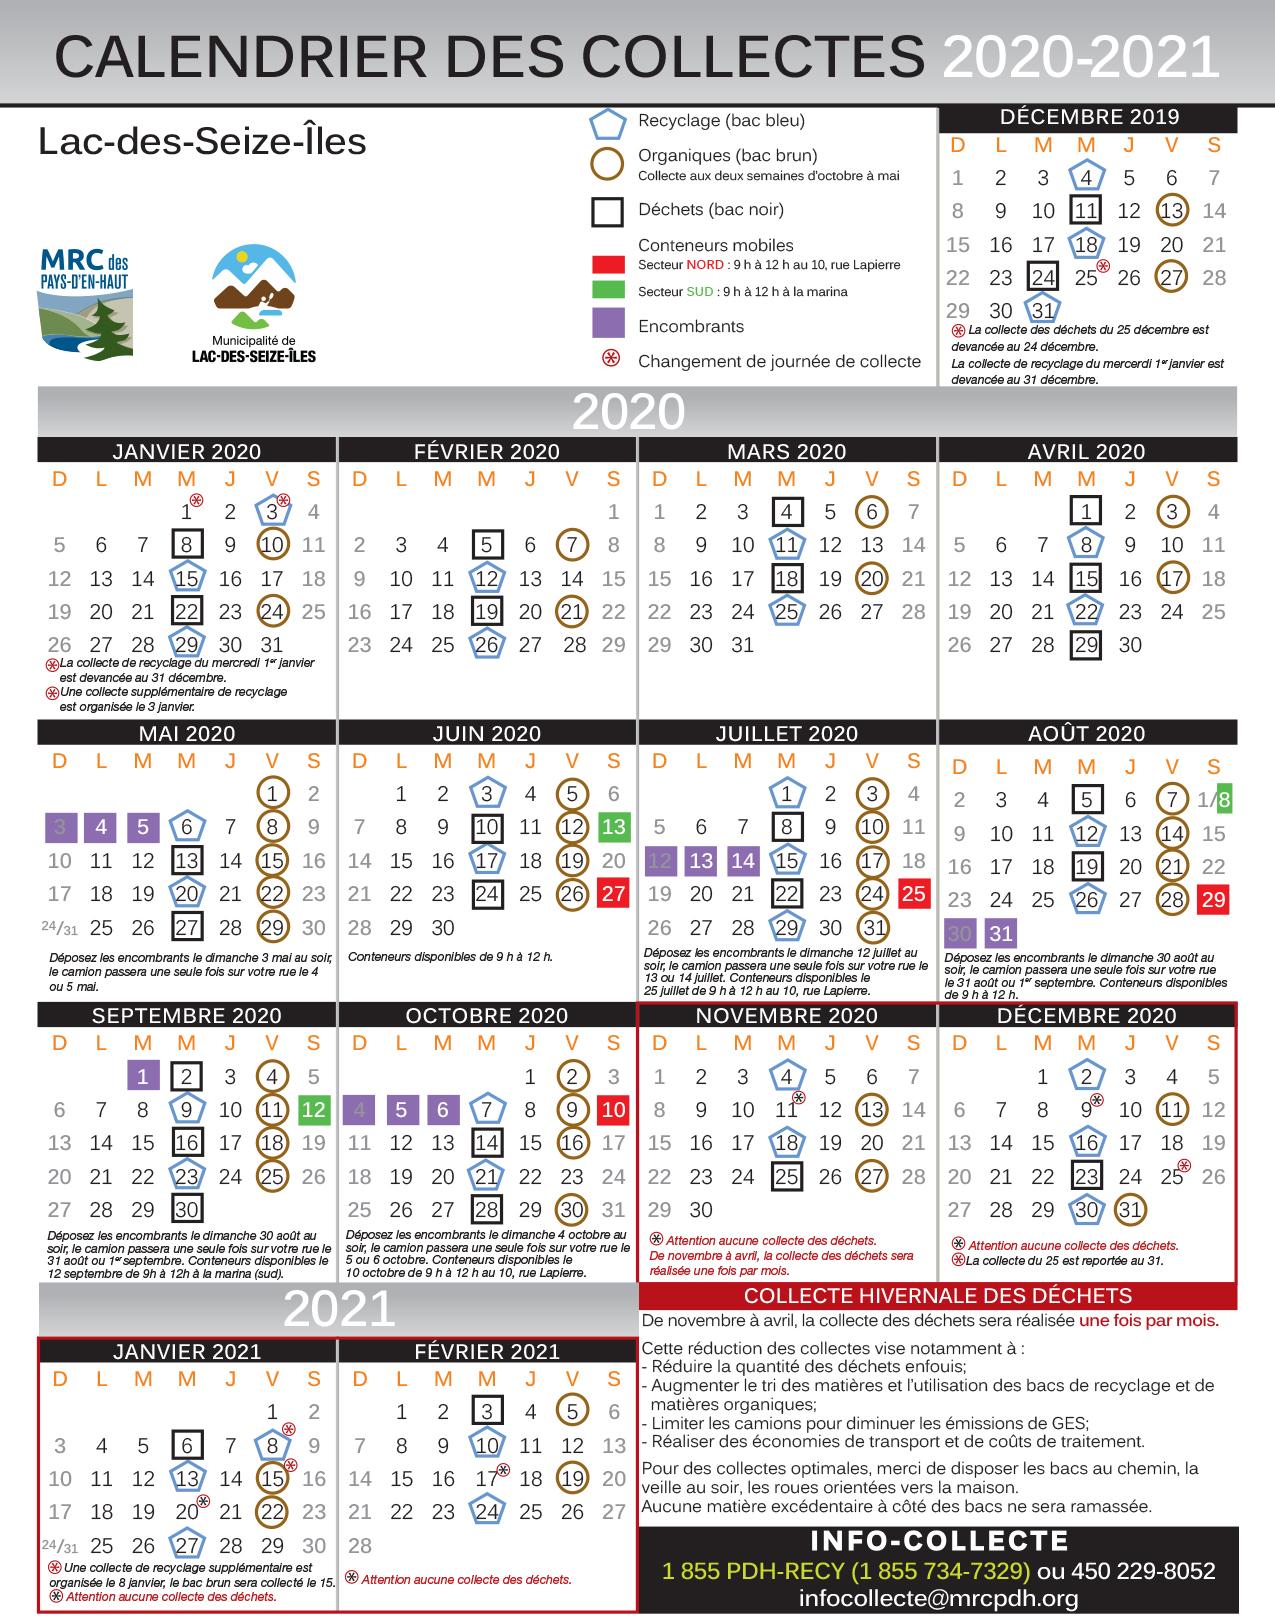 Calendrier des collectes 2020-21